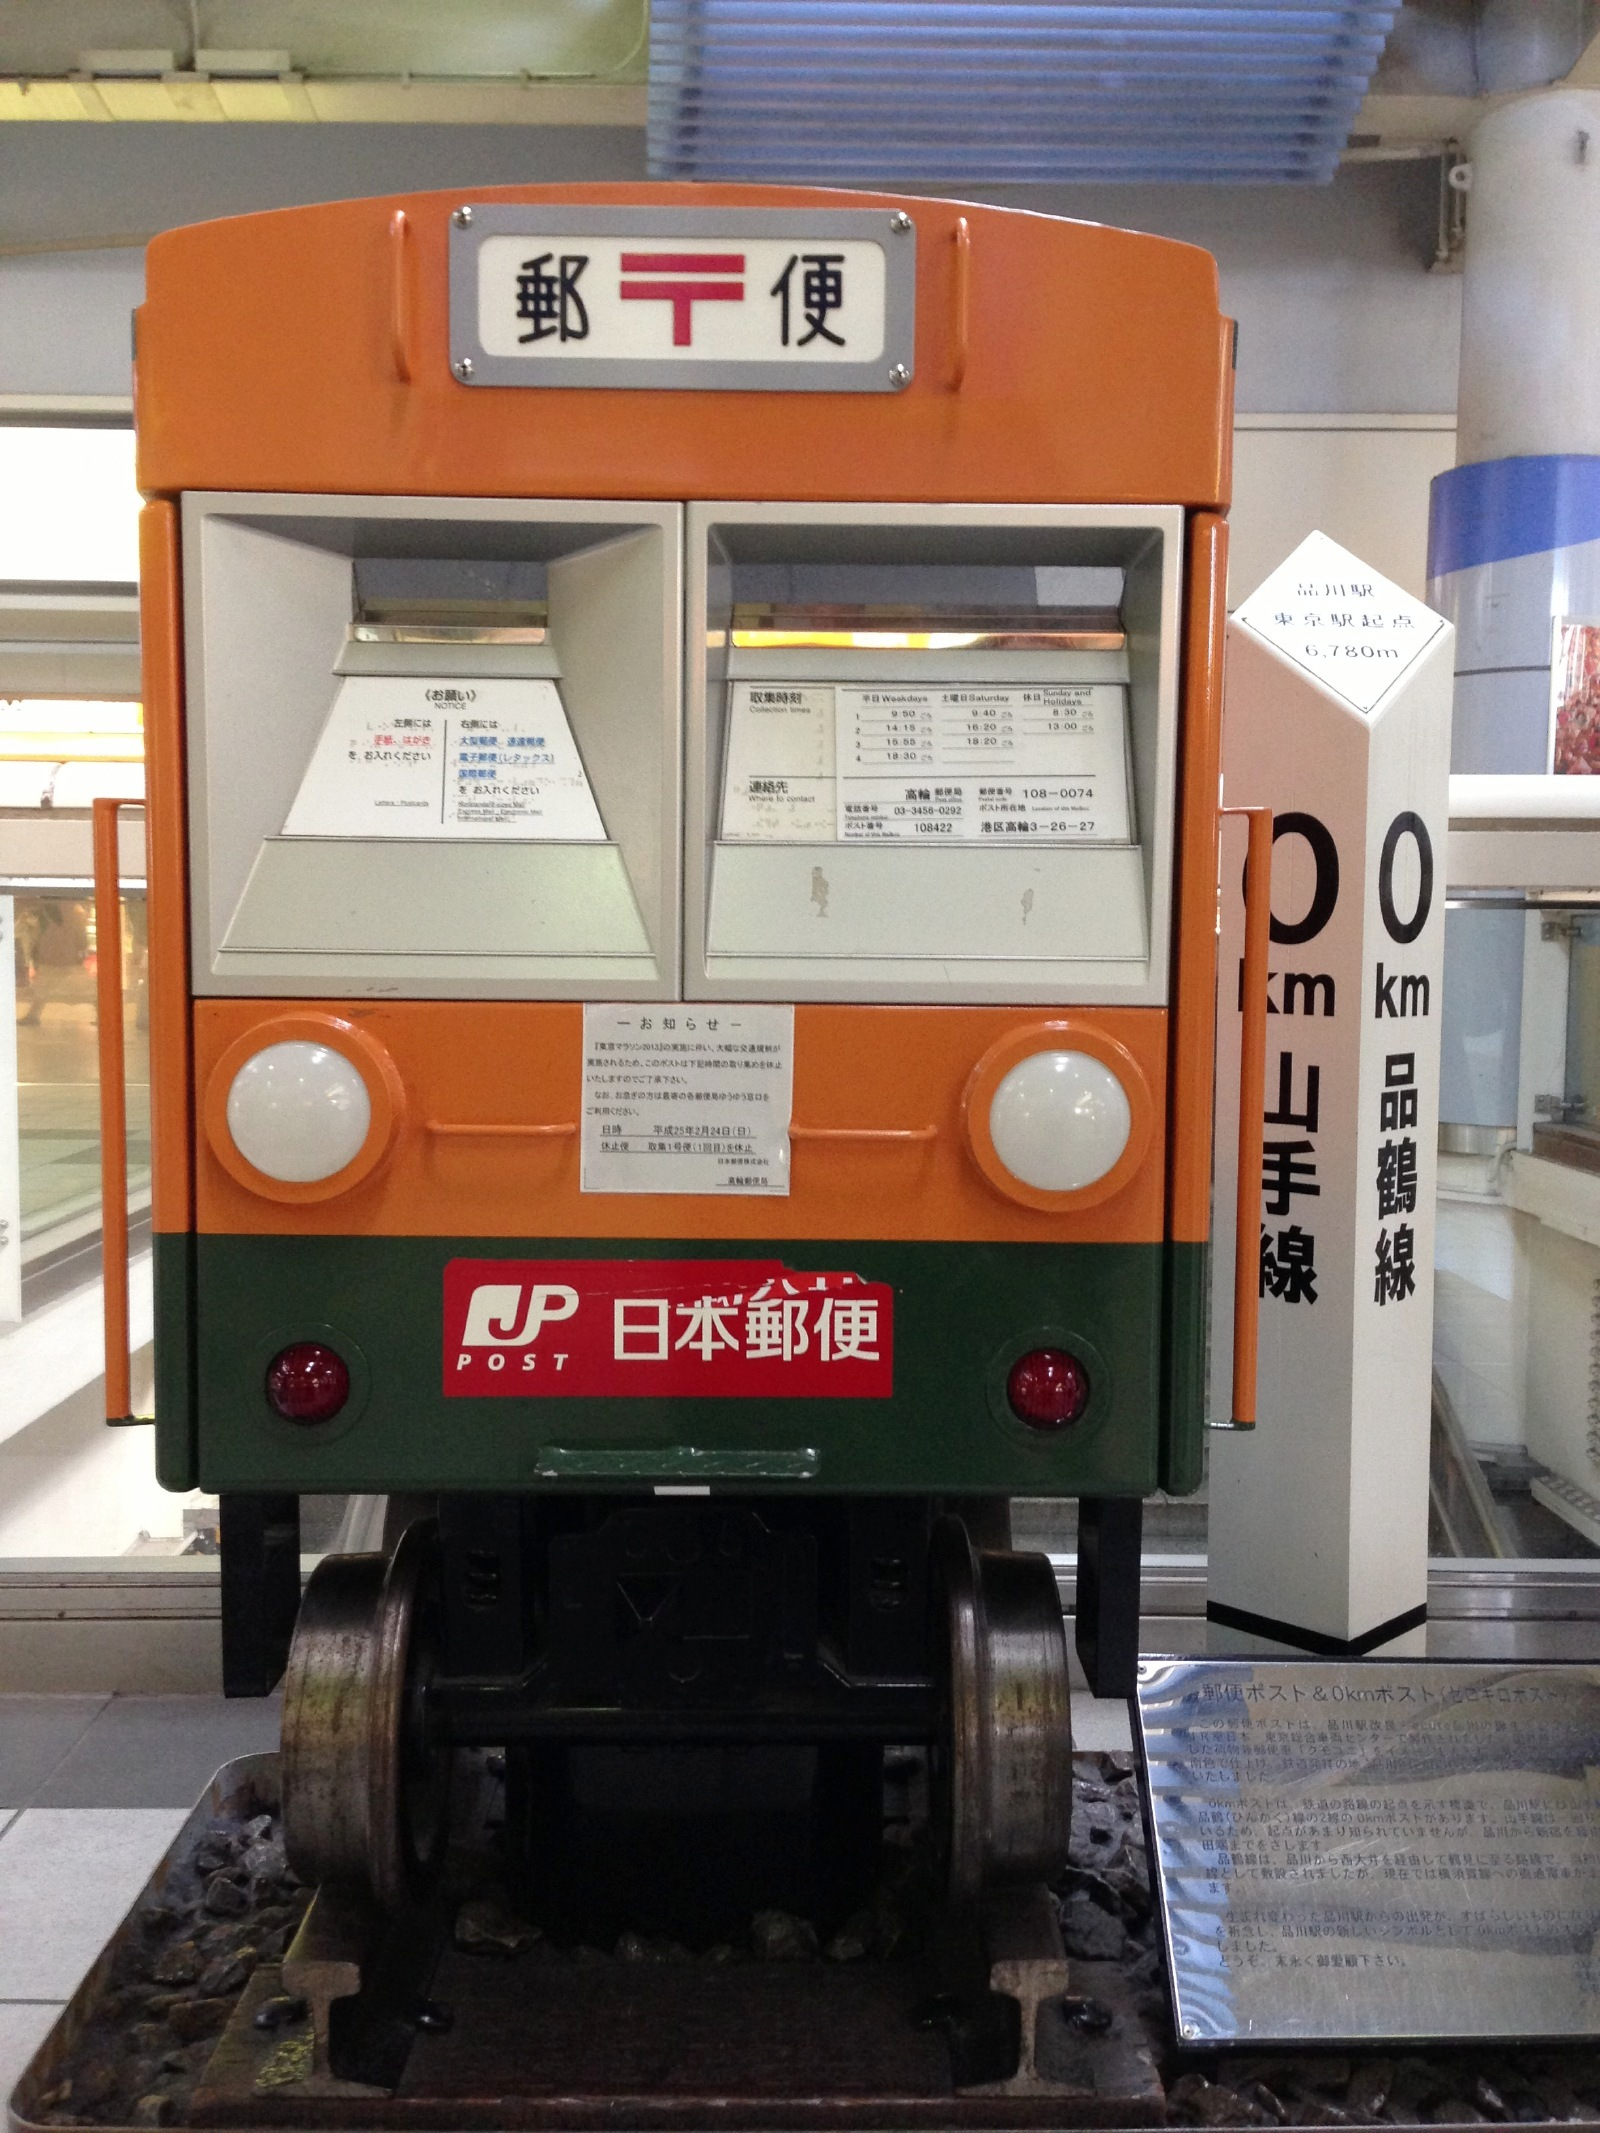 Train Post